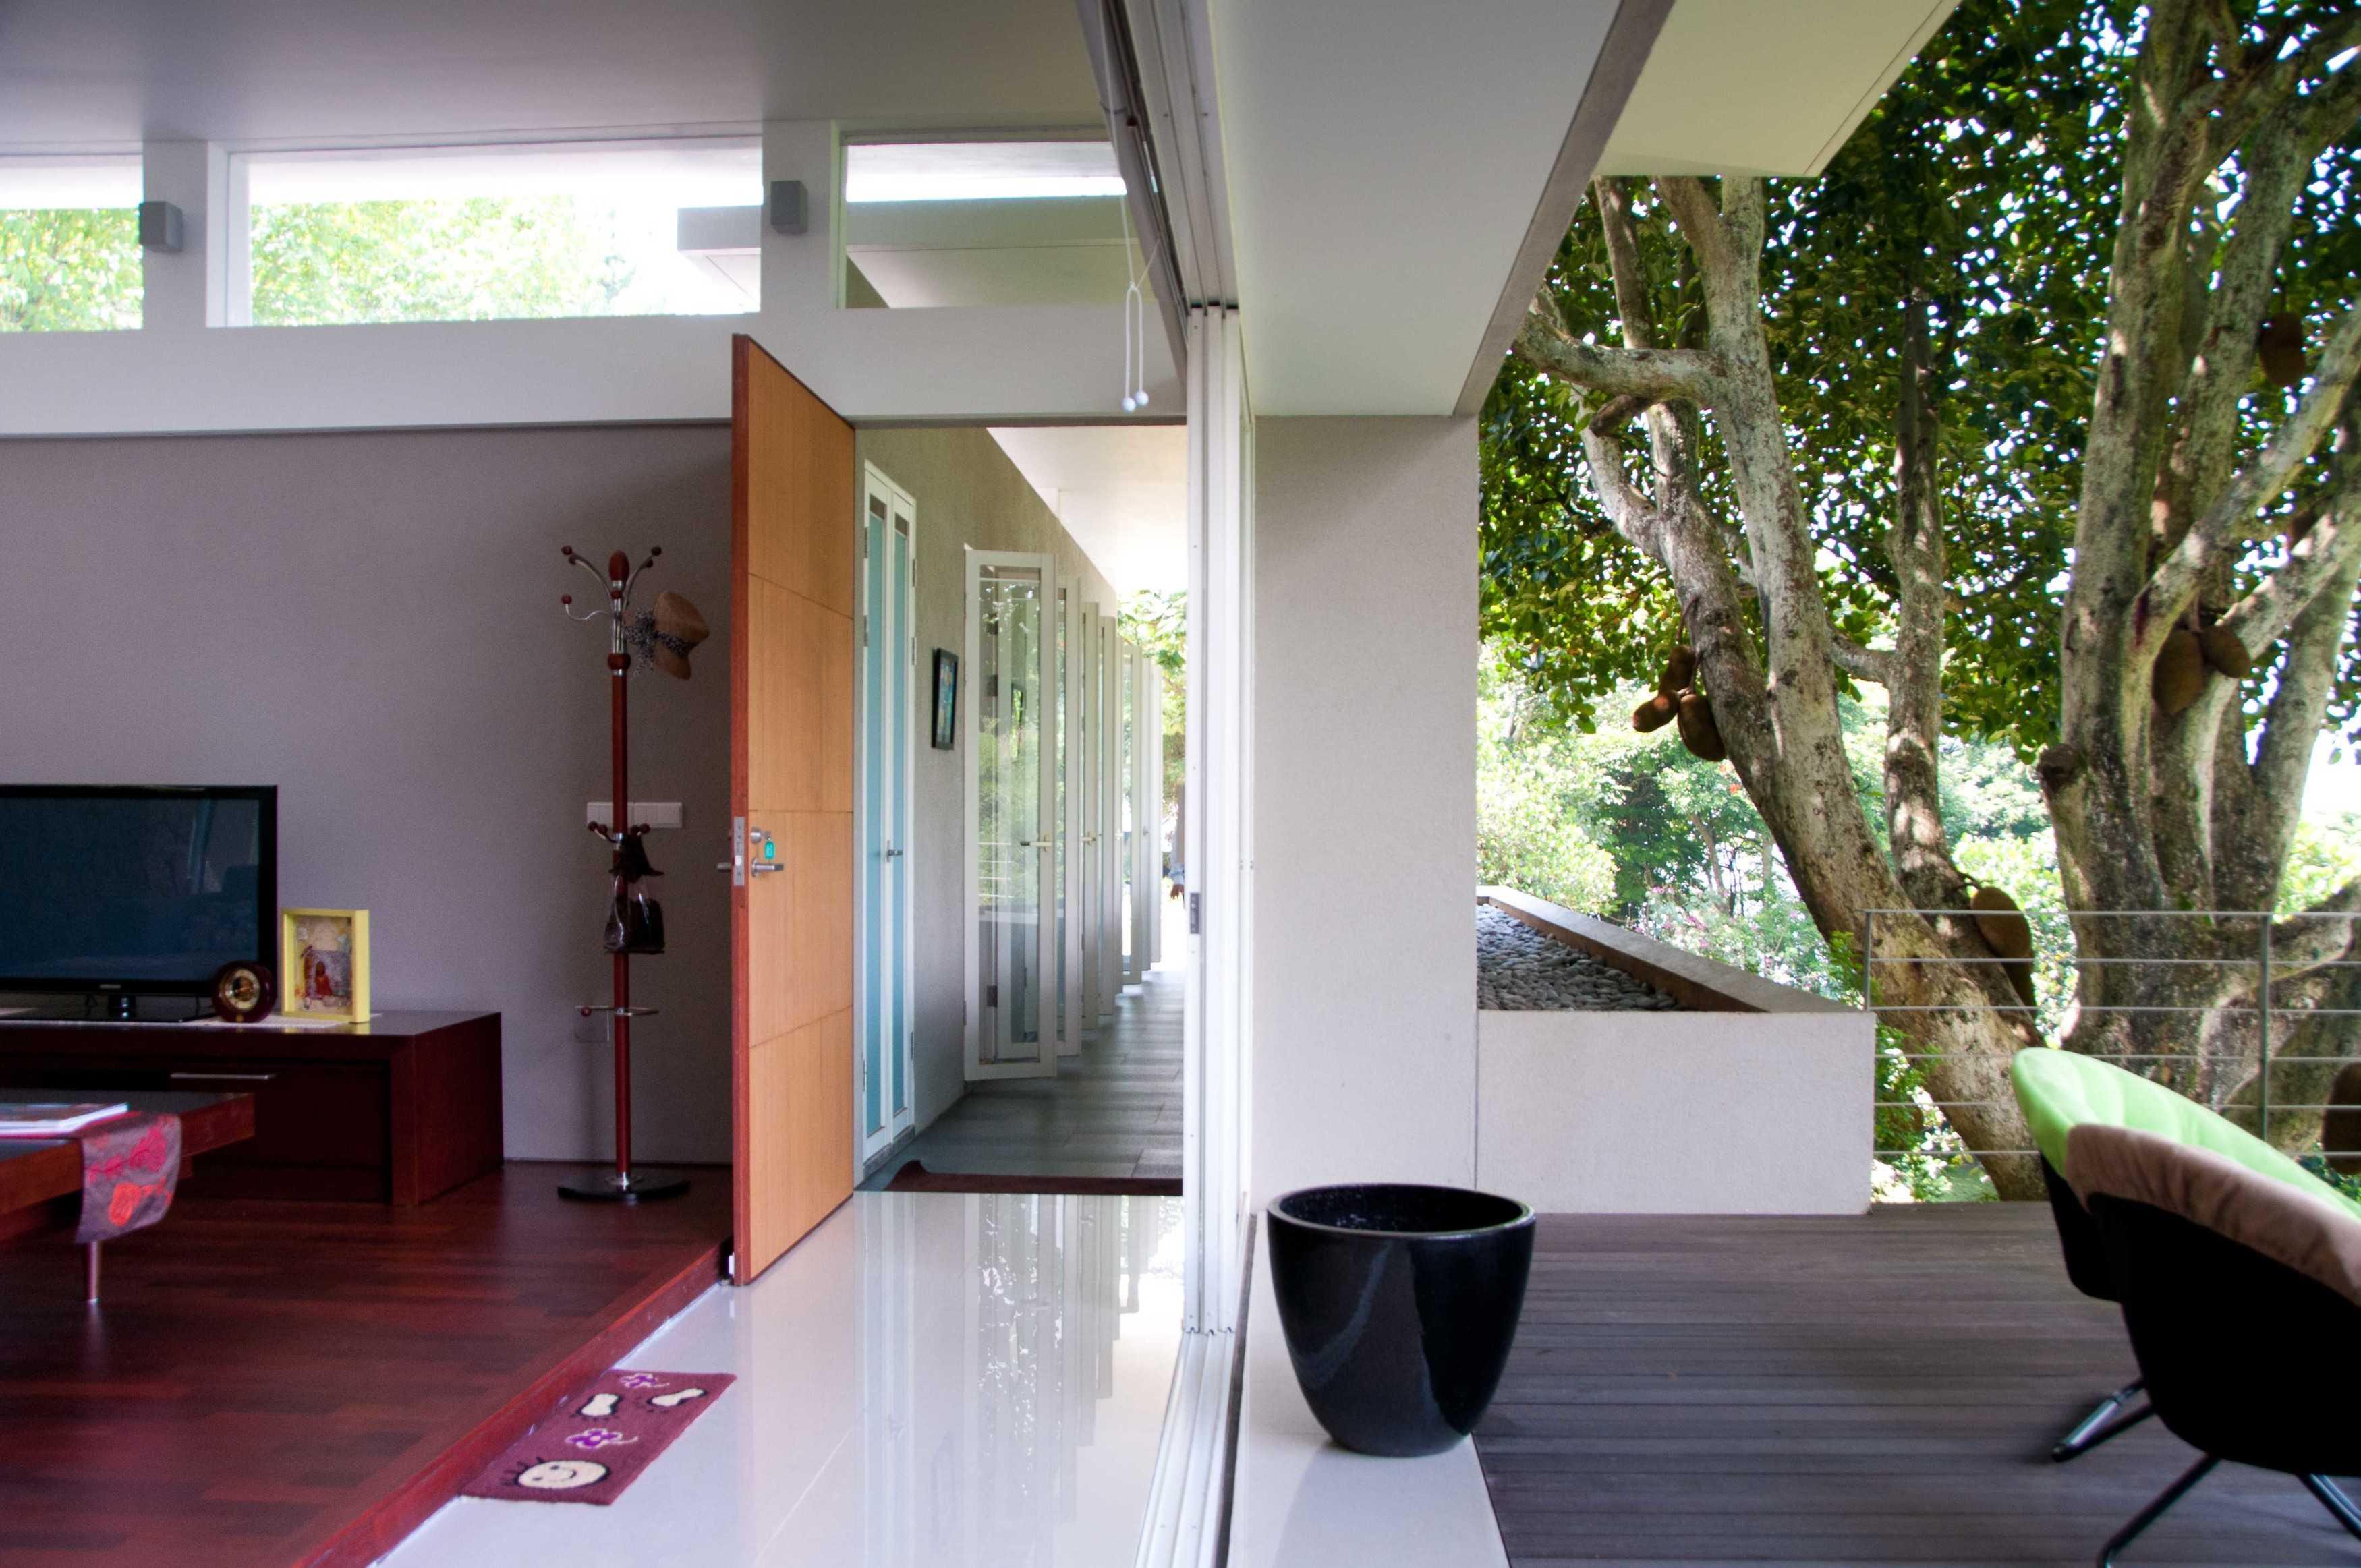 Wastu Cipta Parama Villa Sindangwaas Bandung, Kota Bandung, Jawa Barat, Indonesia Bandung, Kota Bandung, Jawa Barat, Indonesia Interior   79119